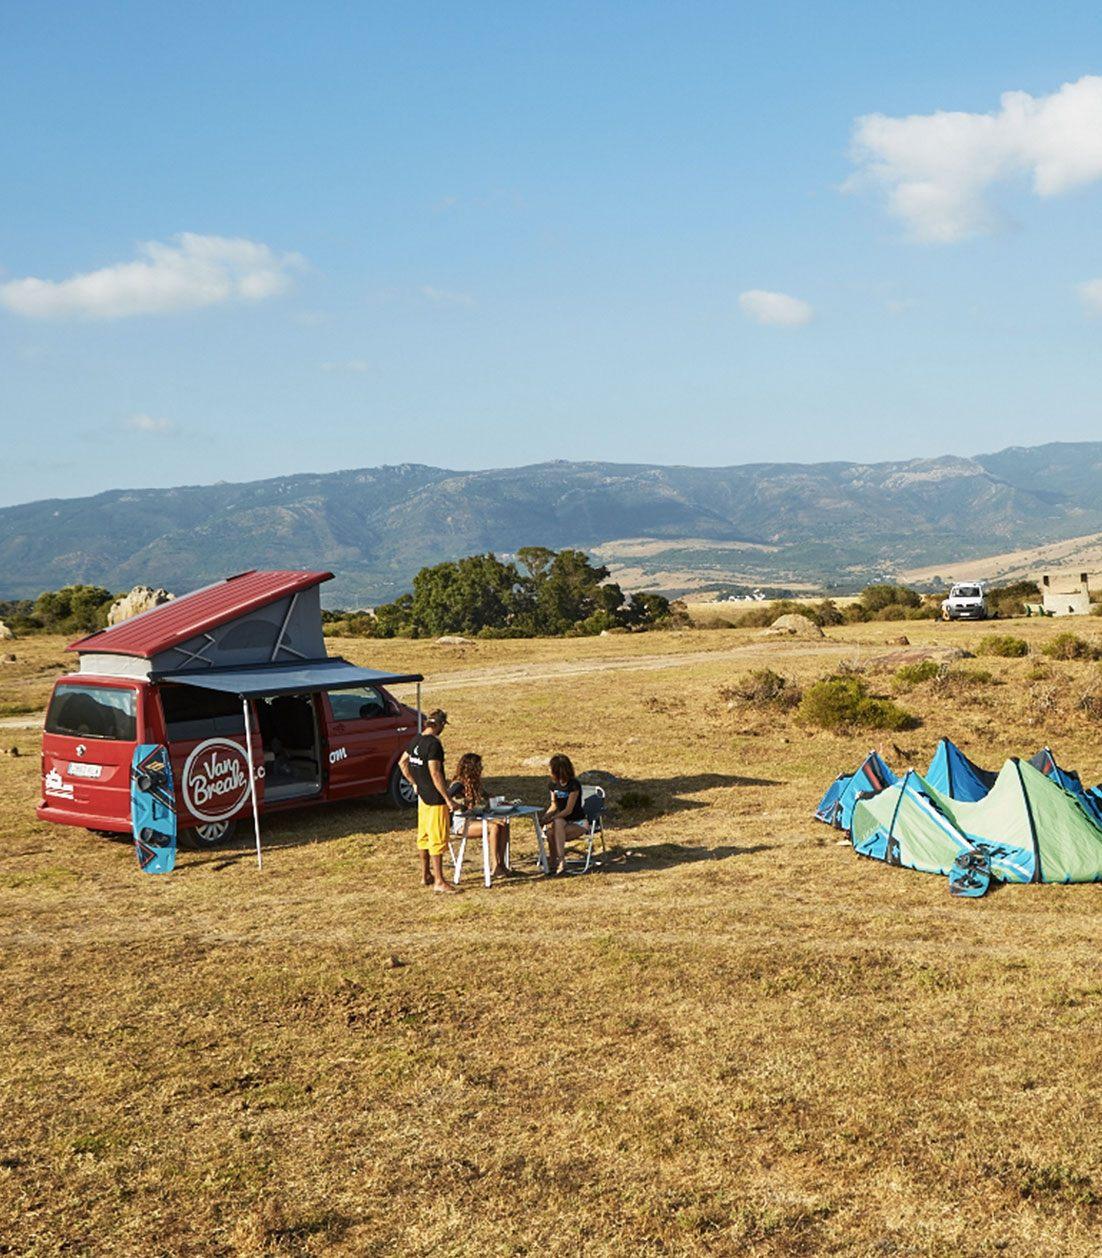 Road Trip Campervan Tarifa with kitesurfing lessons